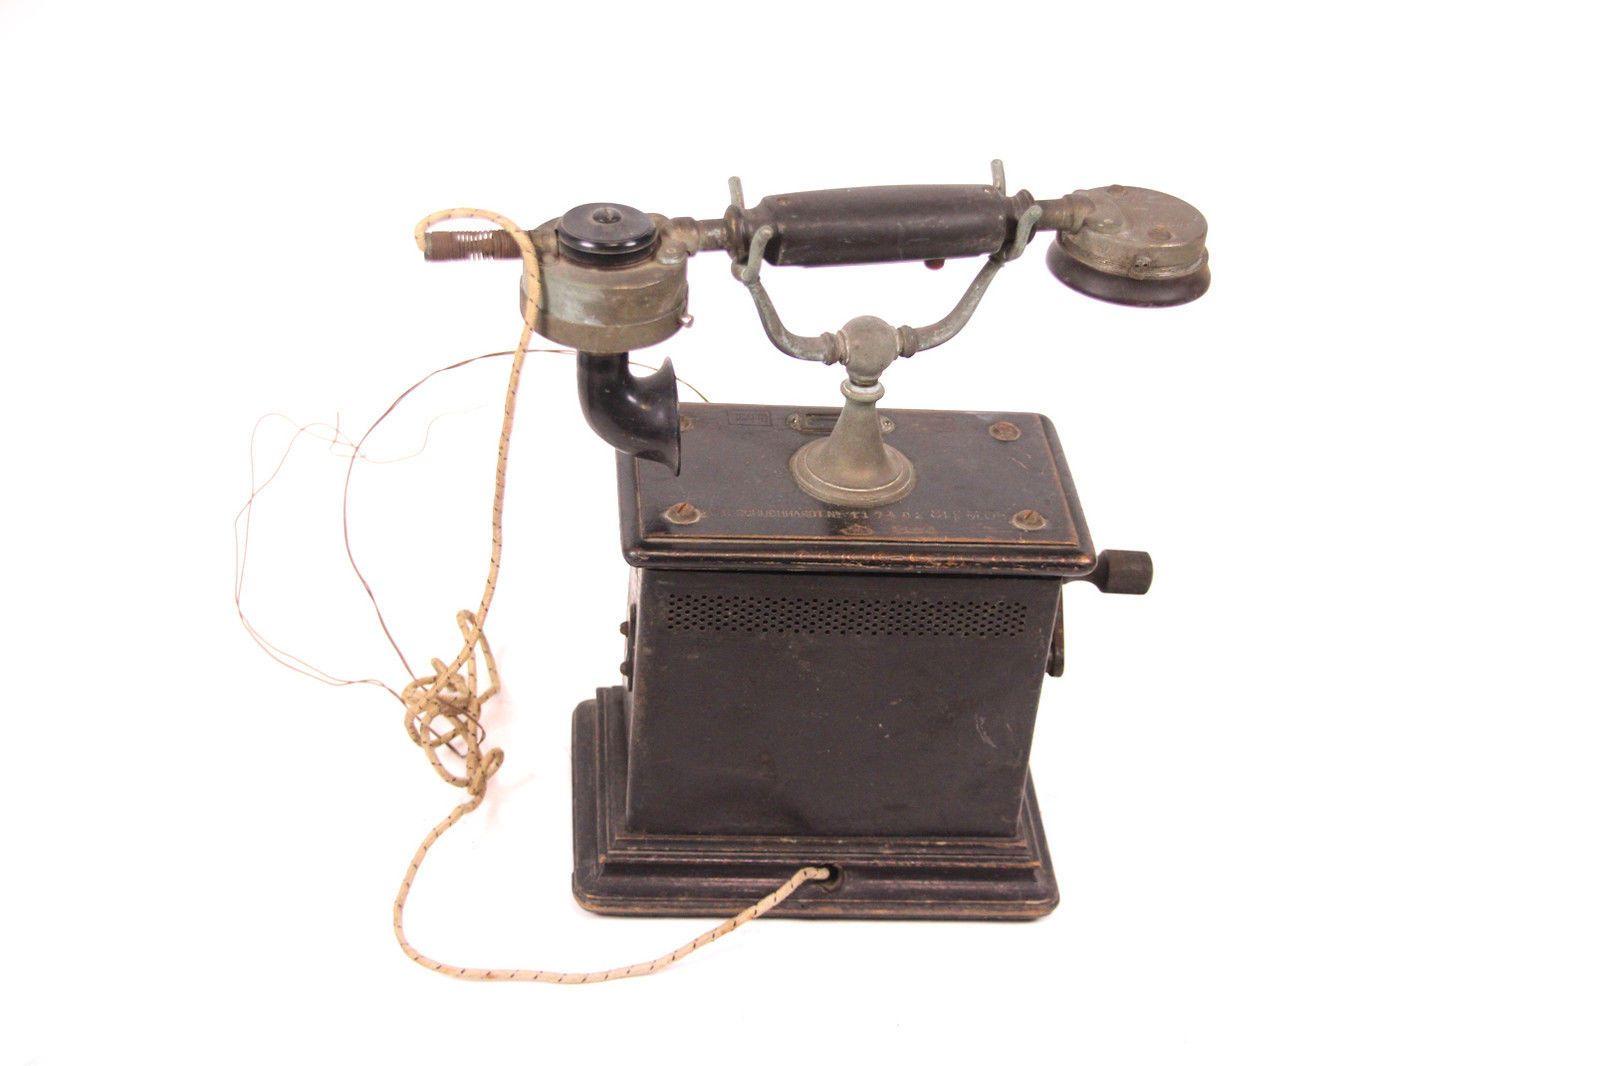 Altes Kurbeltelefon F Schuchhardt 117402 Stf M 05 Kurbel Telefon